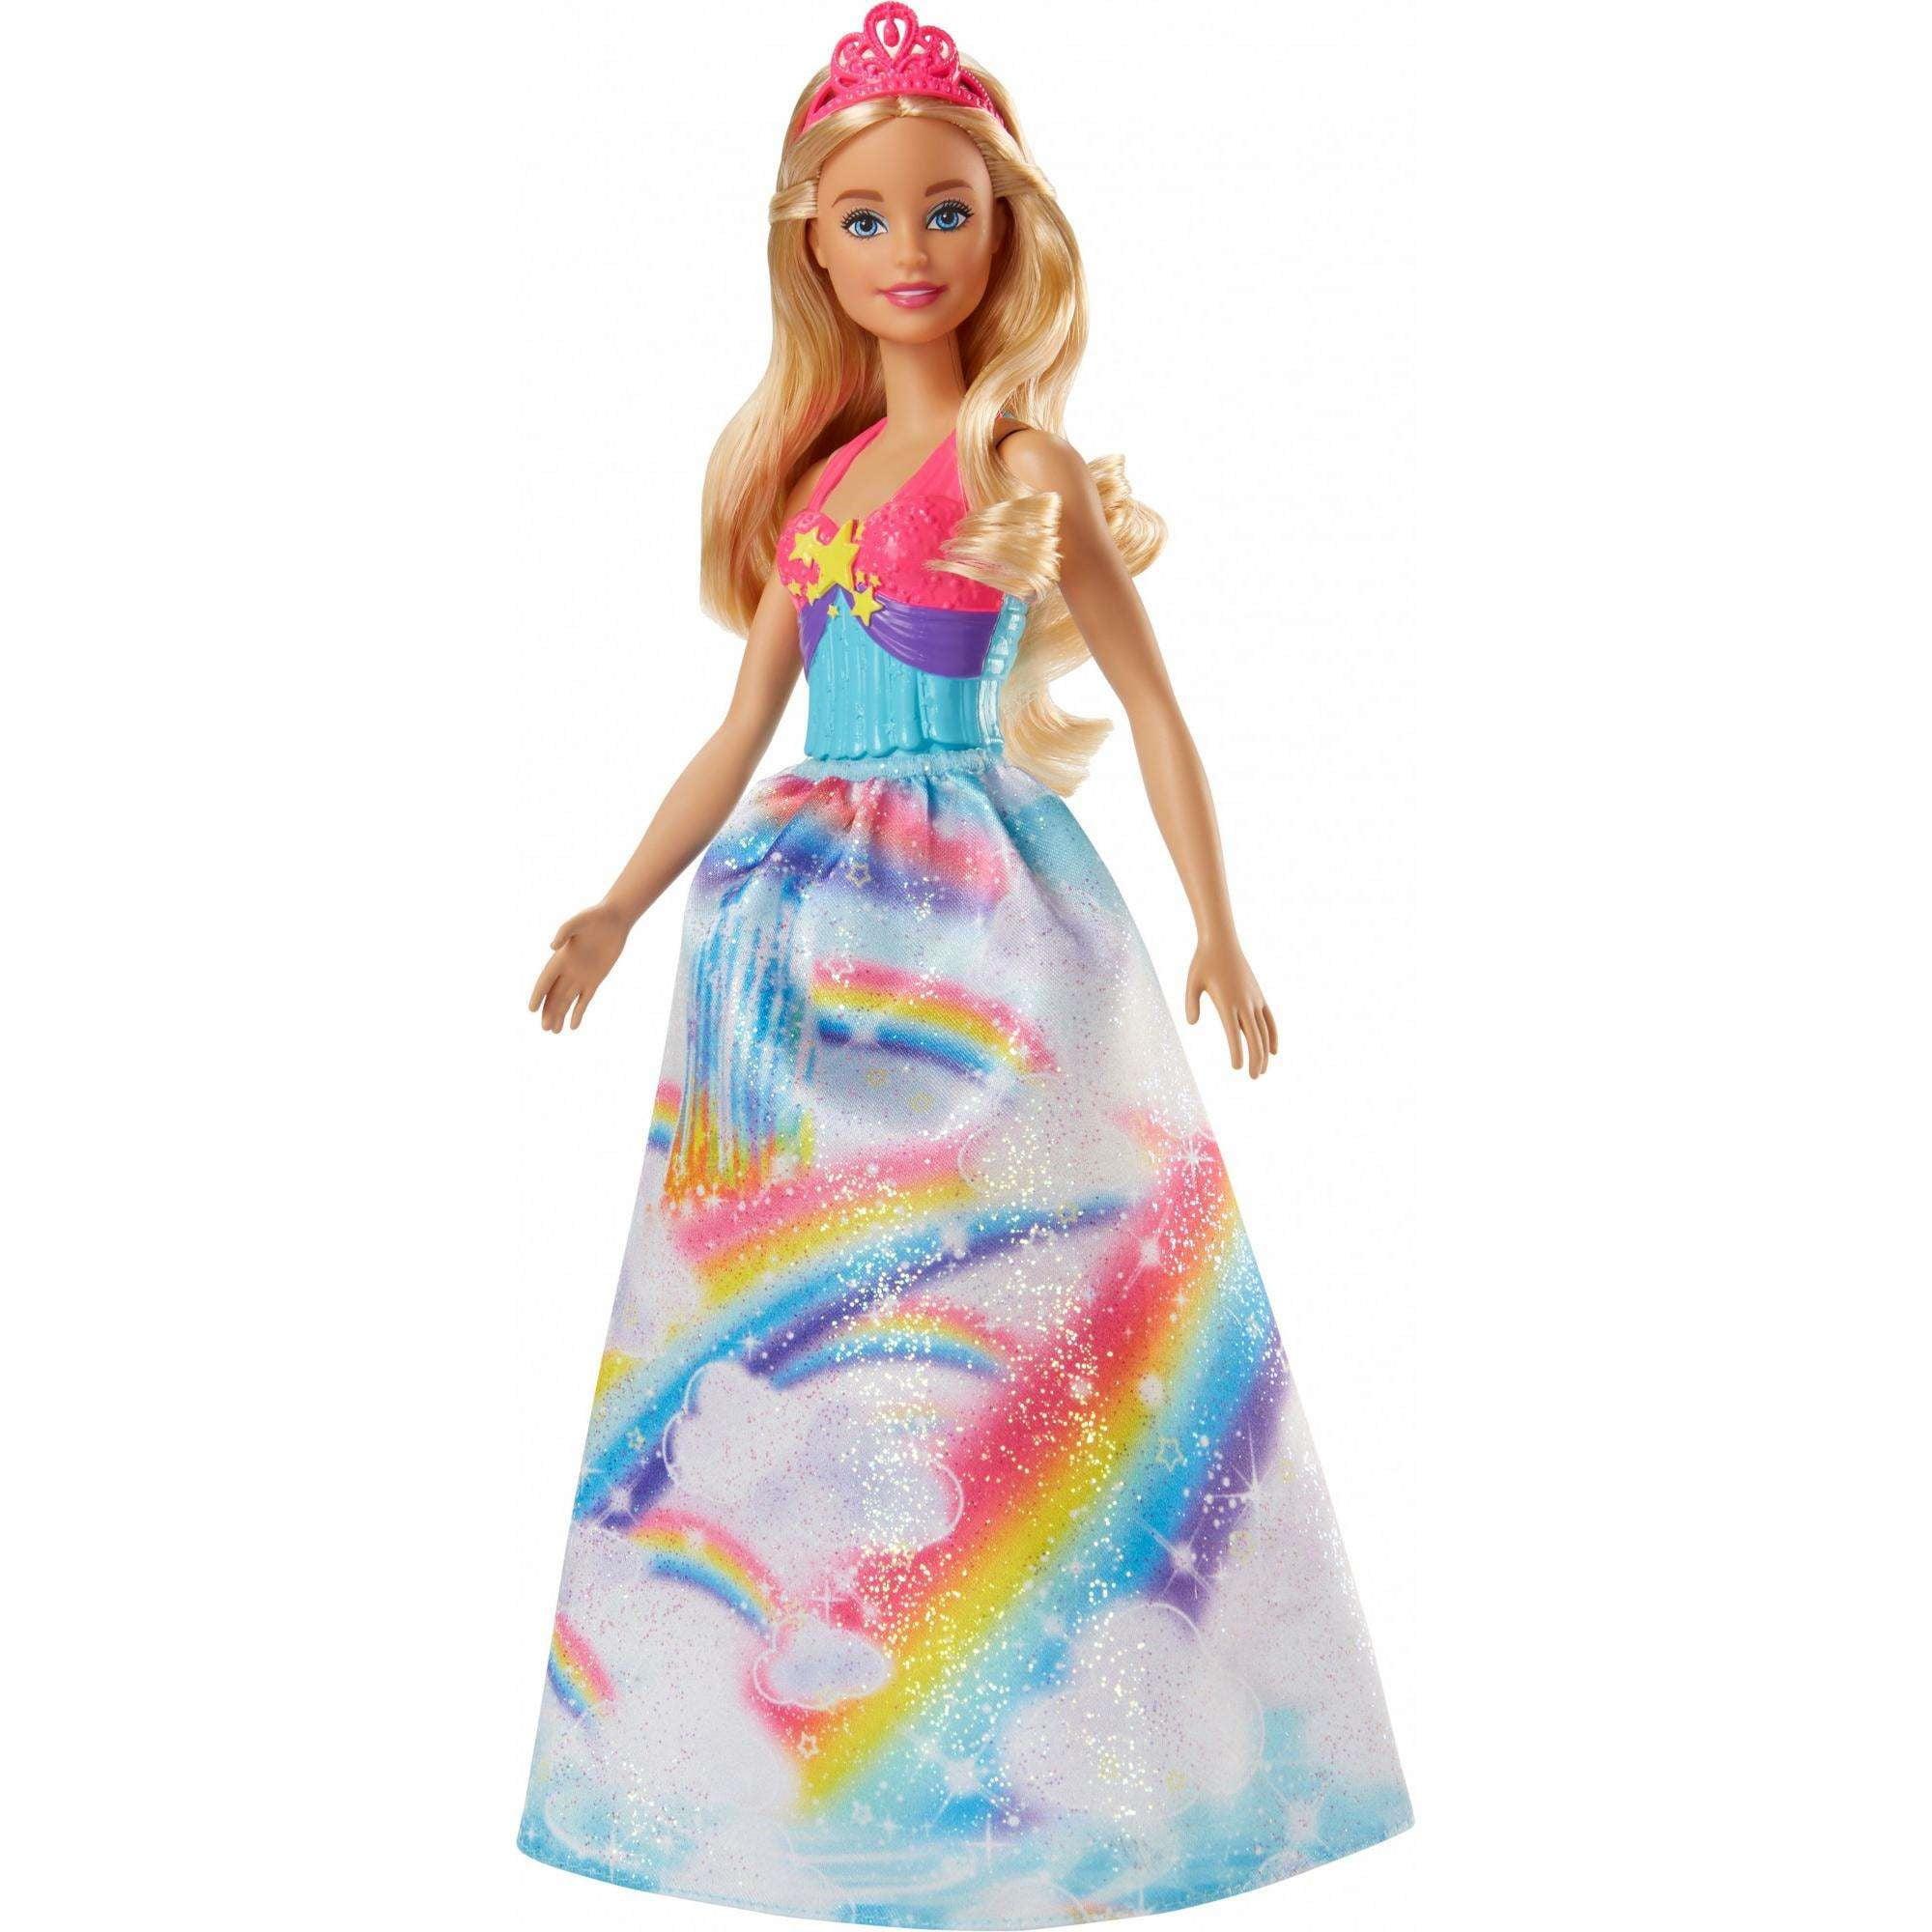 Barbie Dreamtopia Princess Doll, Blond by Barbie